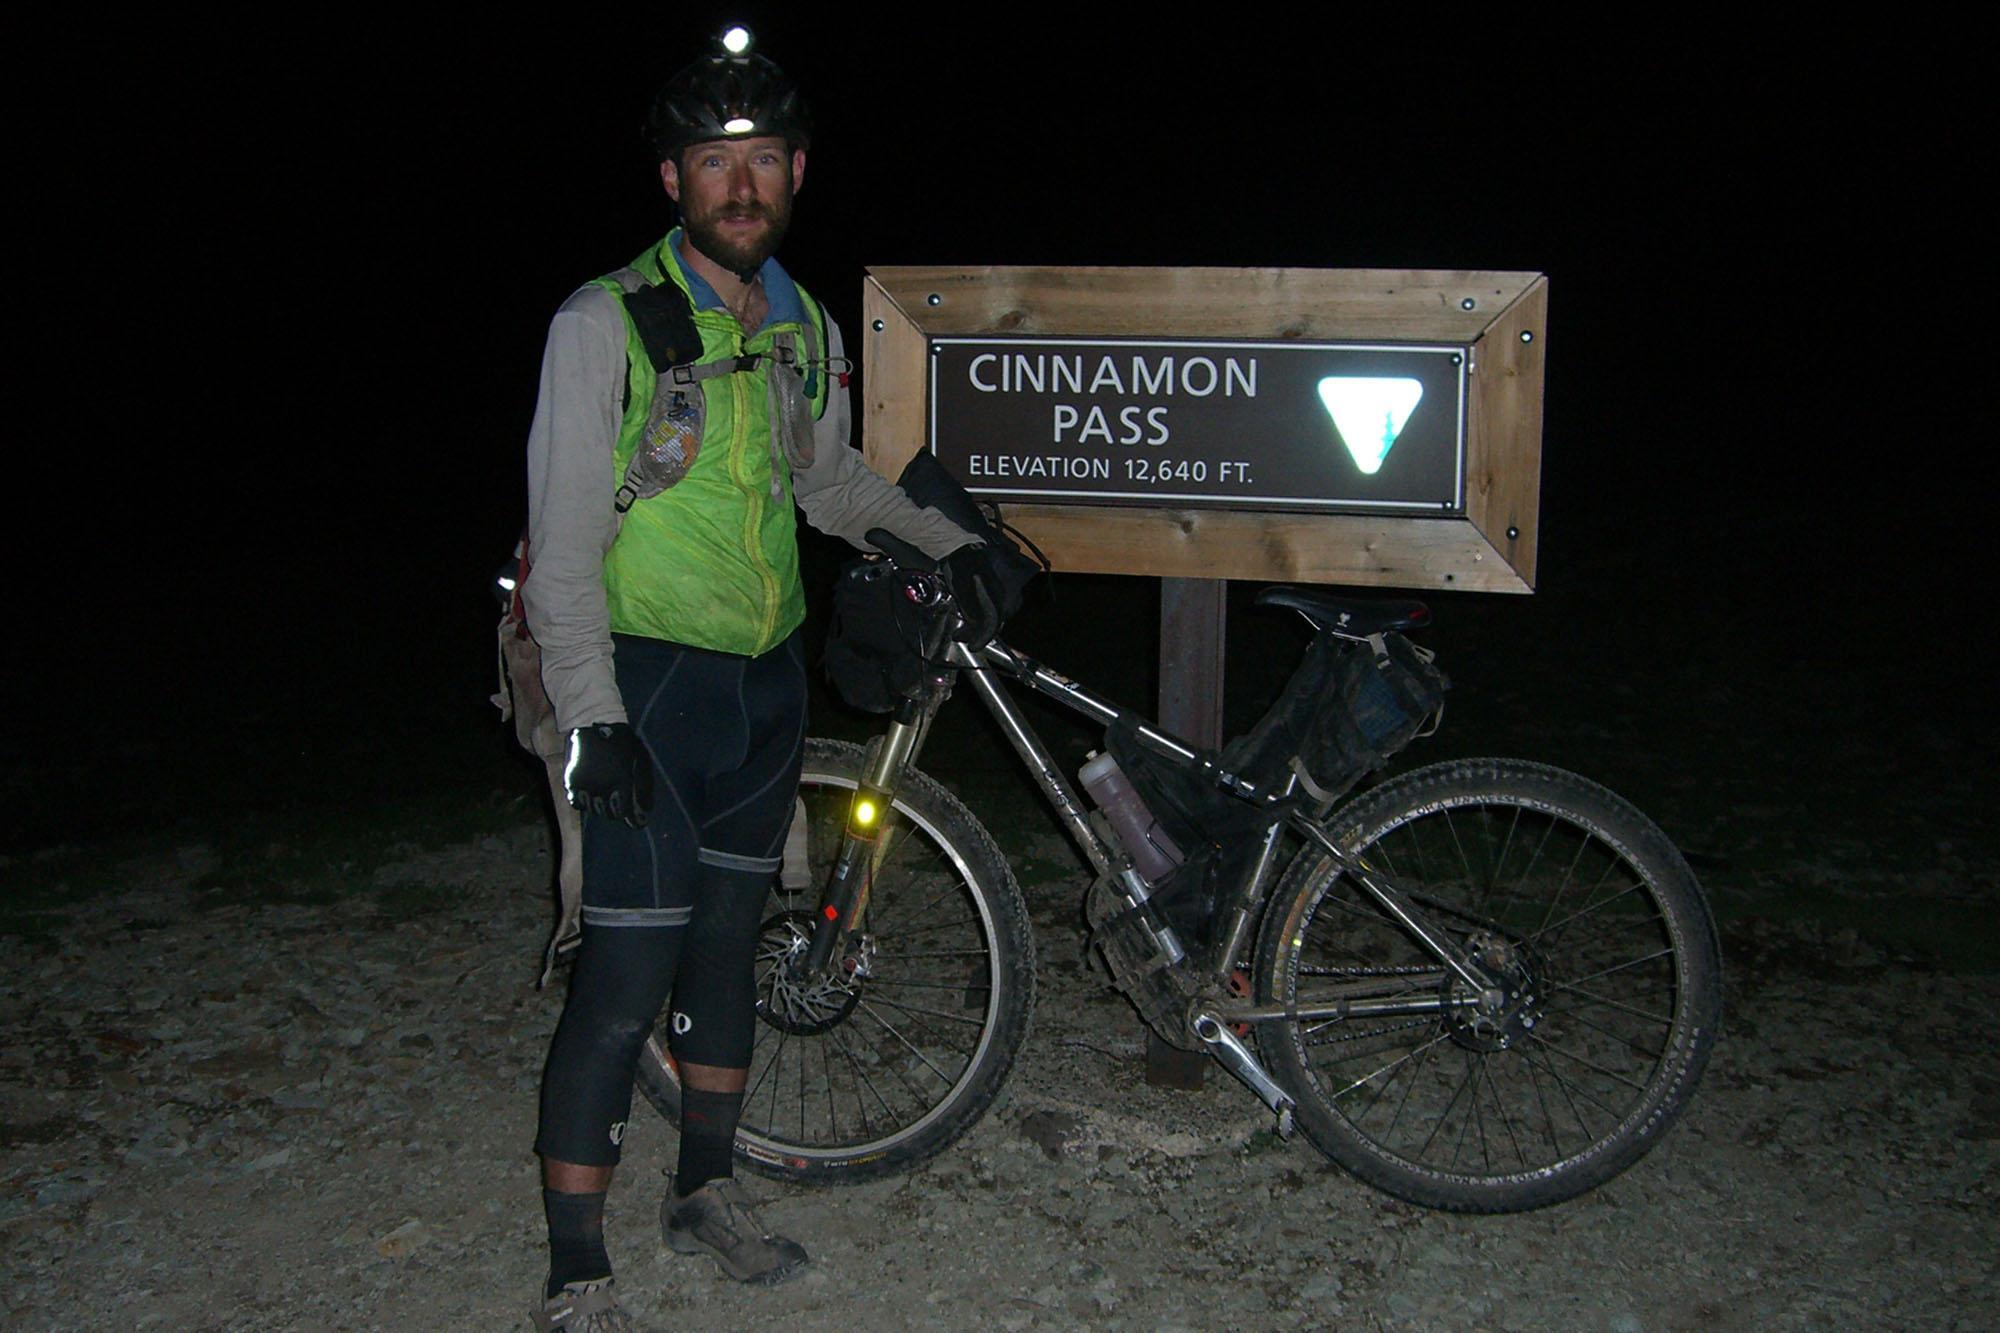 Jefe on Cinnamon Pass